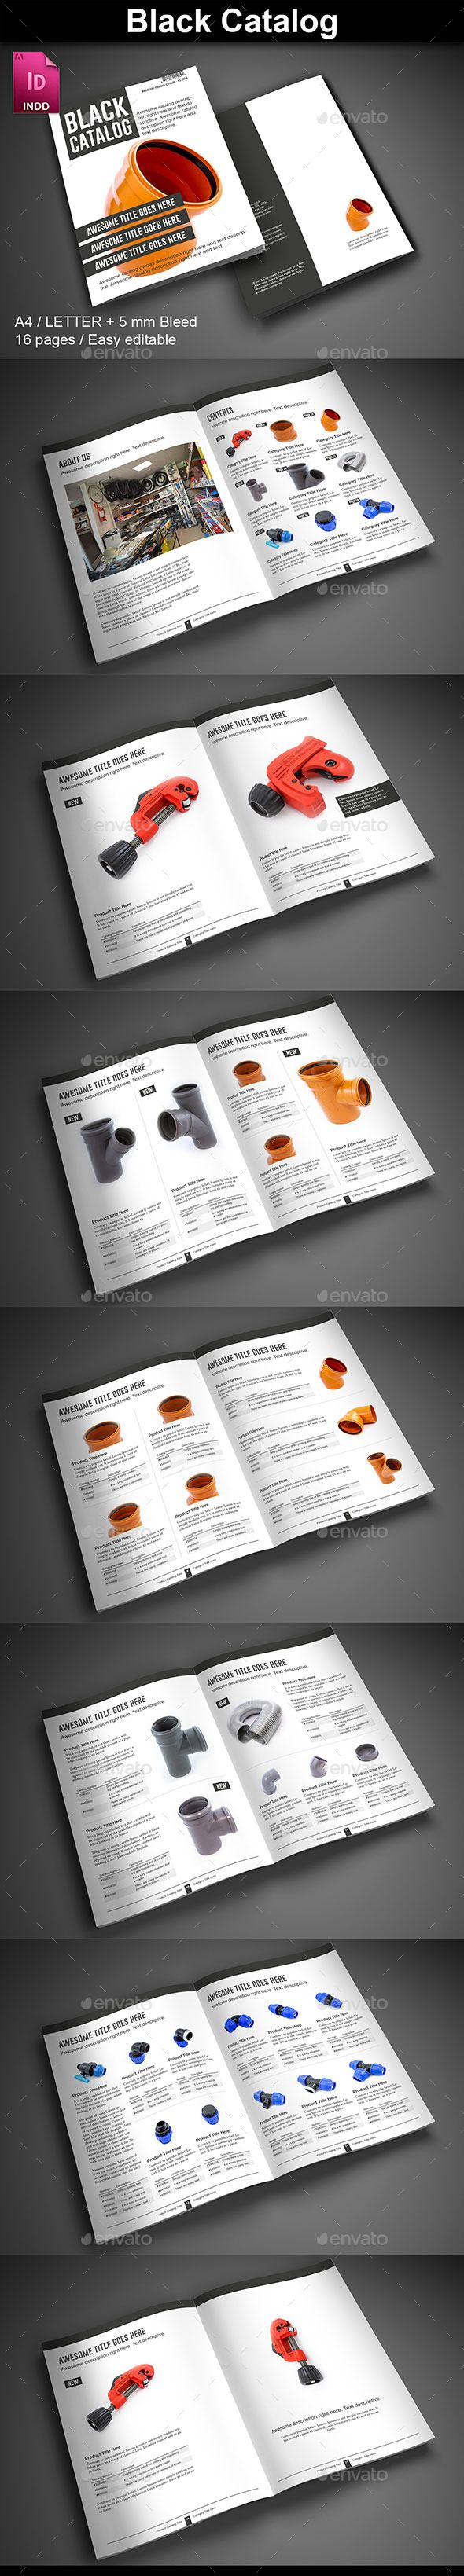 Black Catalog Template #design Download: http://graphicriver.net/item/black-catalog/12587139?ref=ksioks